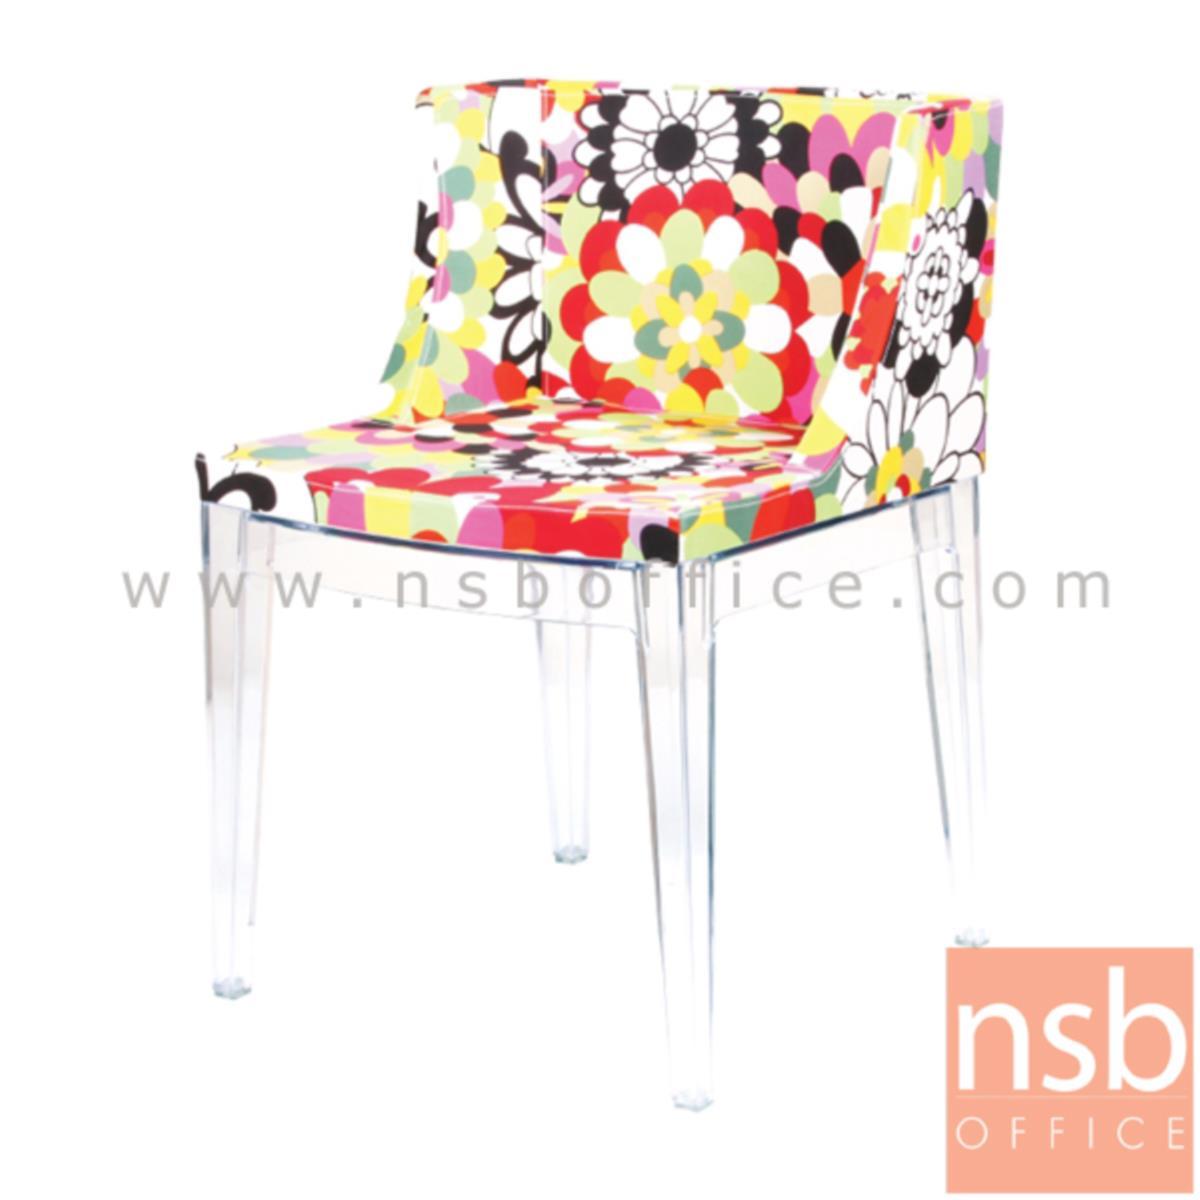 B29A090:เก้าอี้โมเดิร์น Body (Fabric cover) รุ่น PP9261 ขนาด 52.5W cm. ขาพลาสติก(PC)